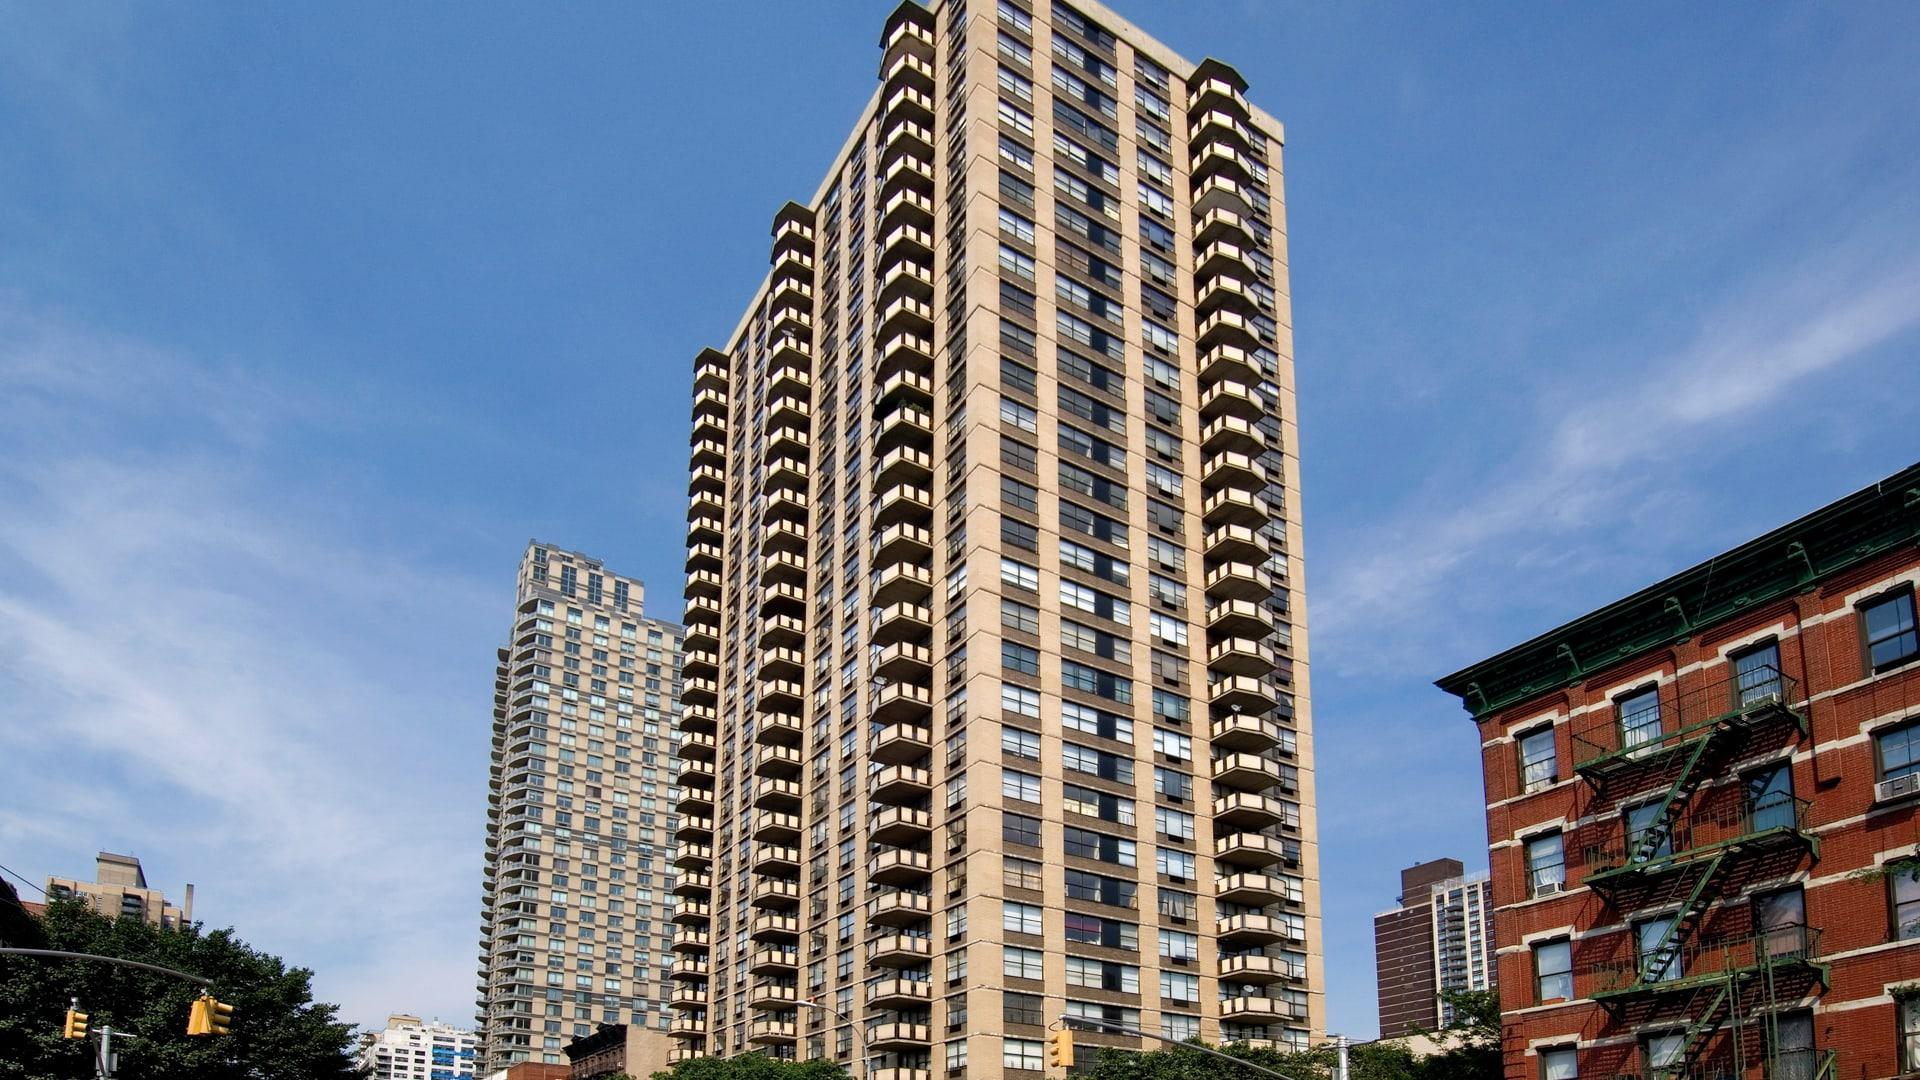 303 East 83rd Apartments - Exterior